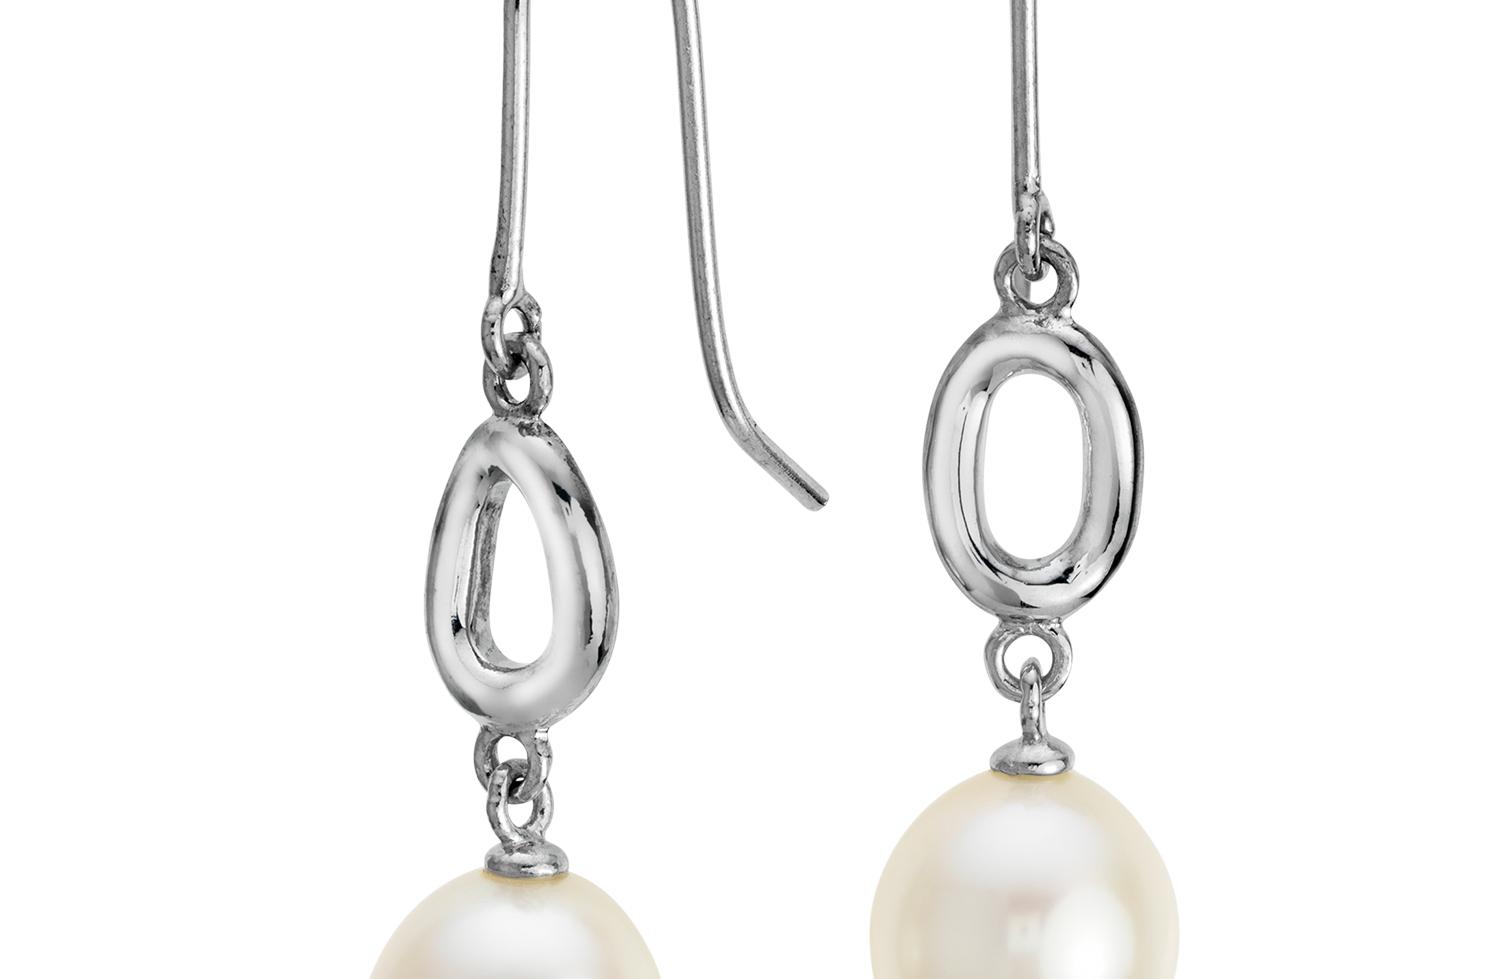 Aretes Infinito de perlas cultivadas de agua dulce en plata de ley (8,5mm)